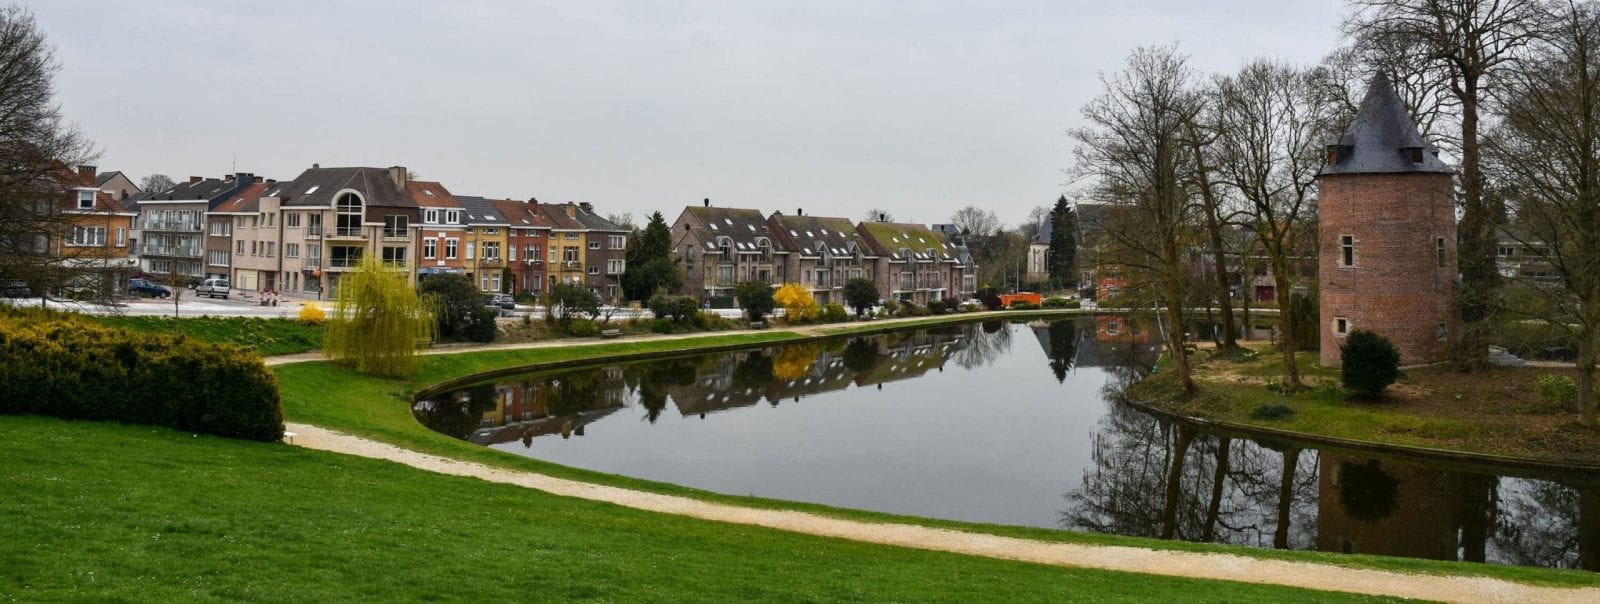 Dilbeek. Belgium